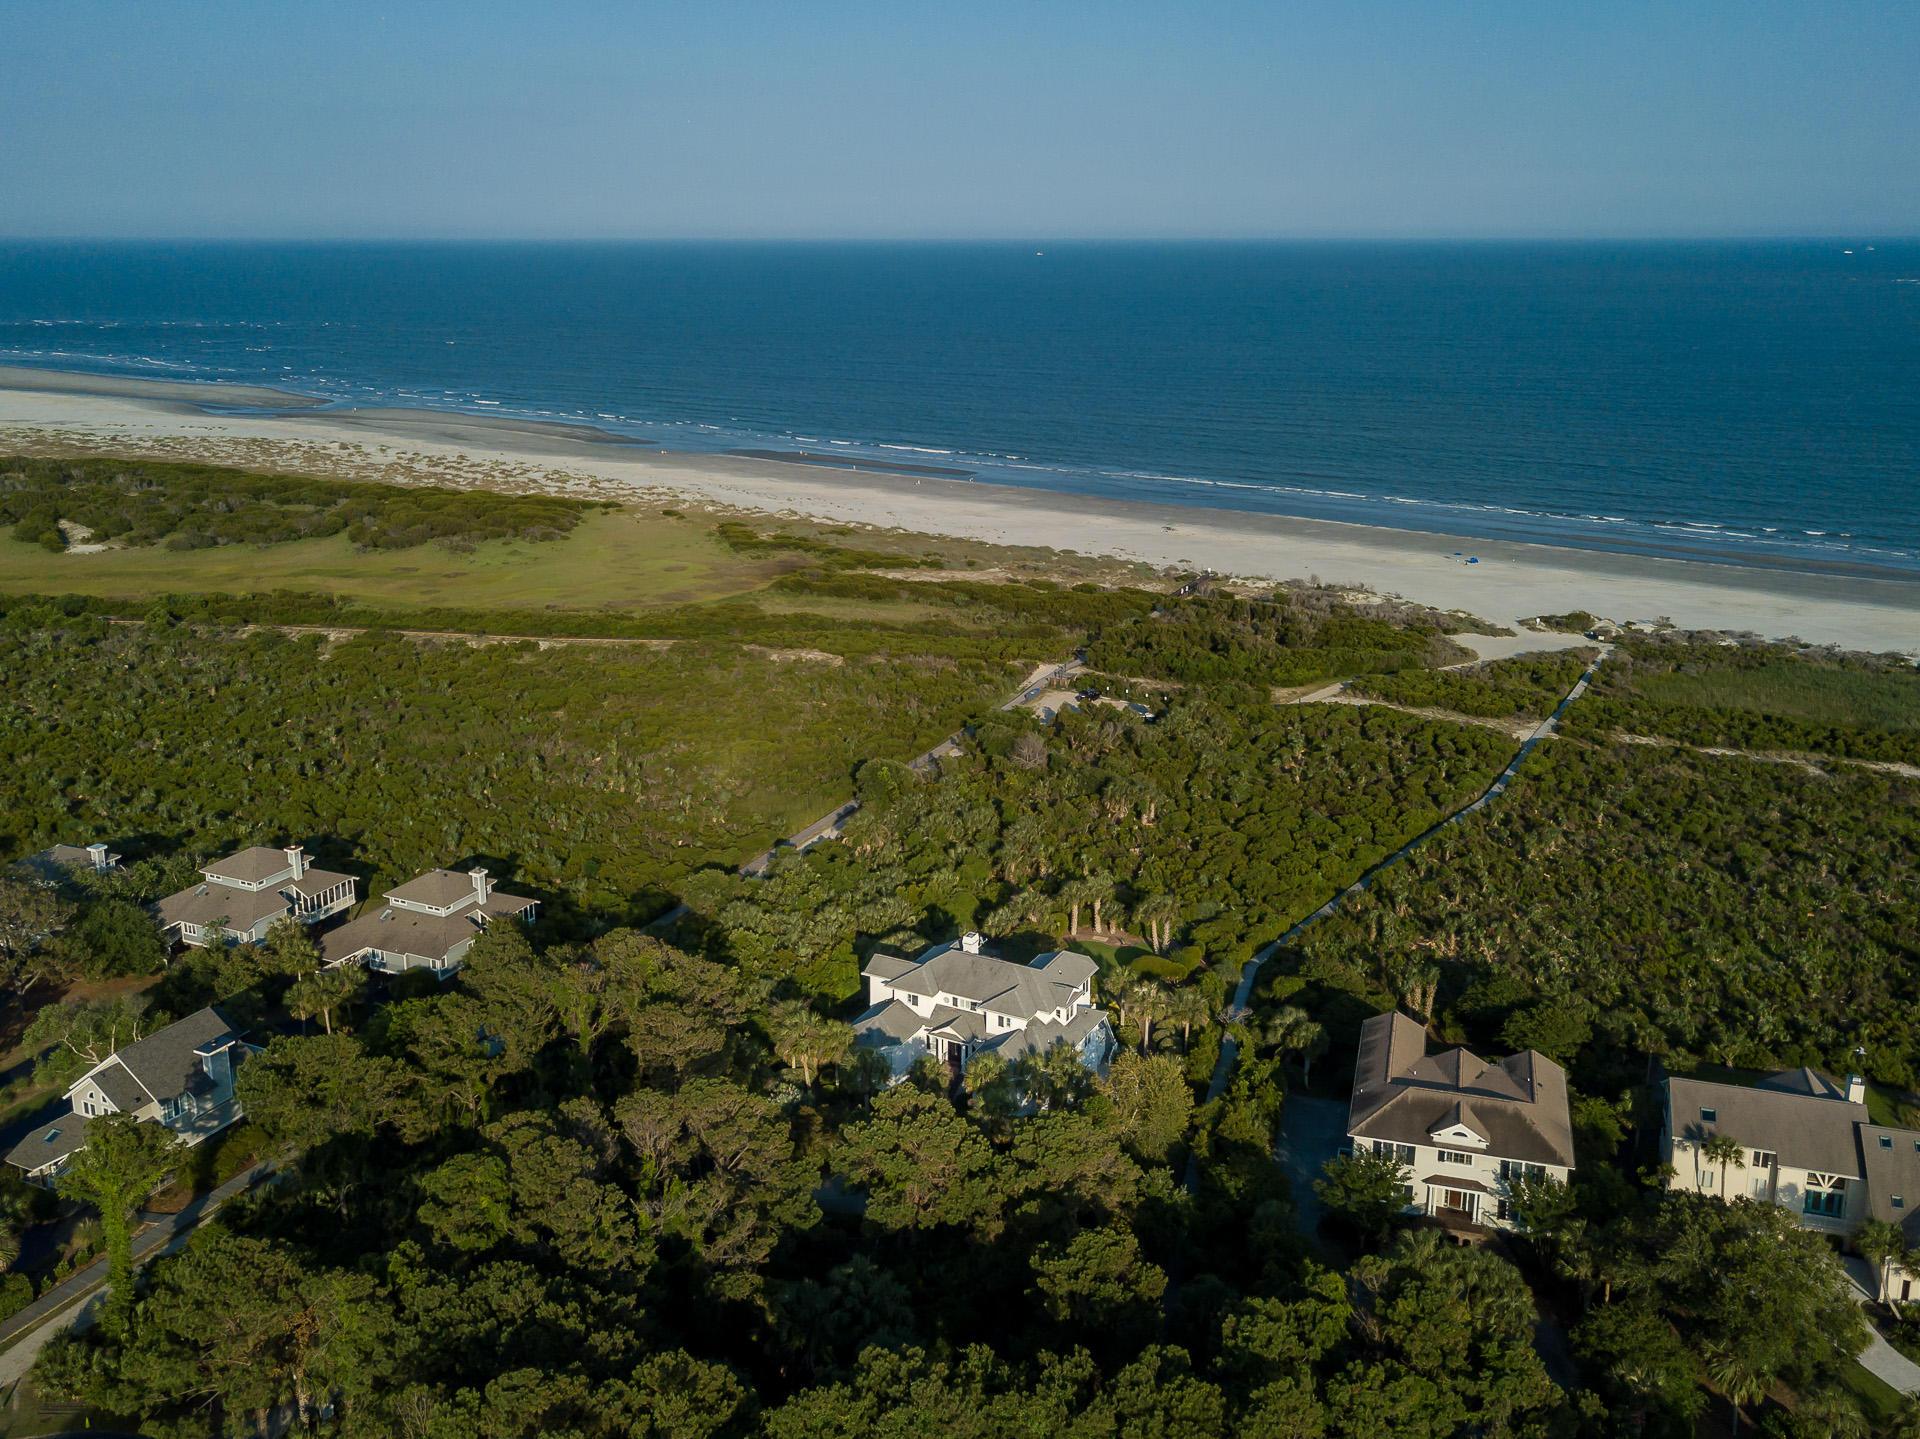 Seabrook Island Homes For Sale - 2216 Rolling Dune, Seabrook Island, SC - 18